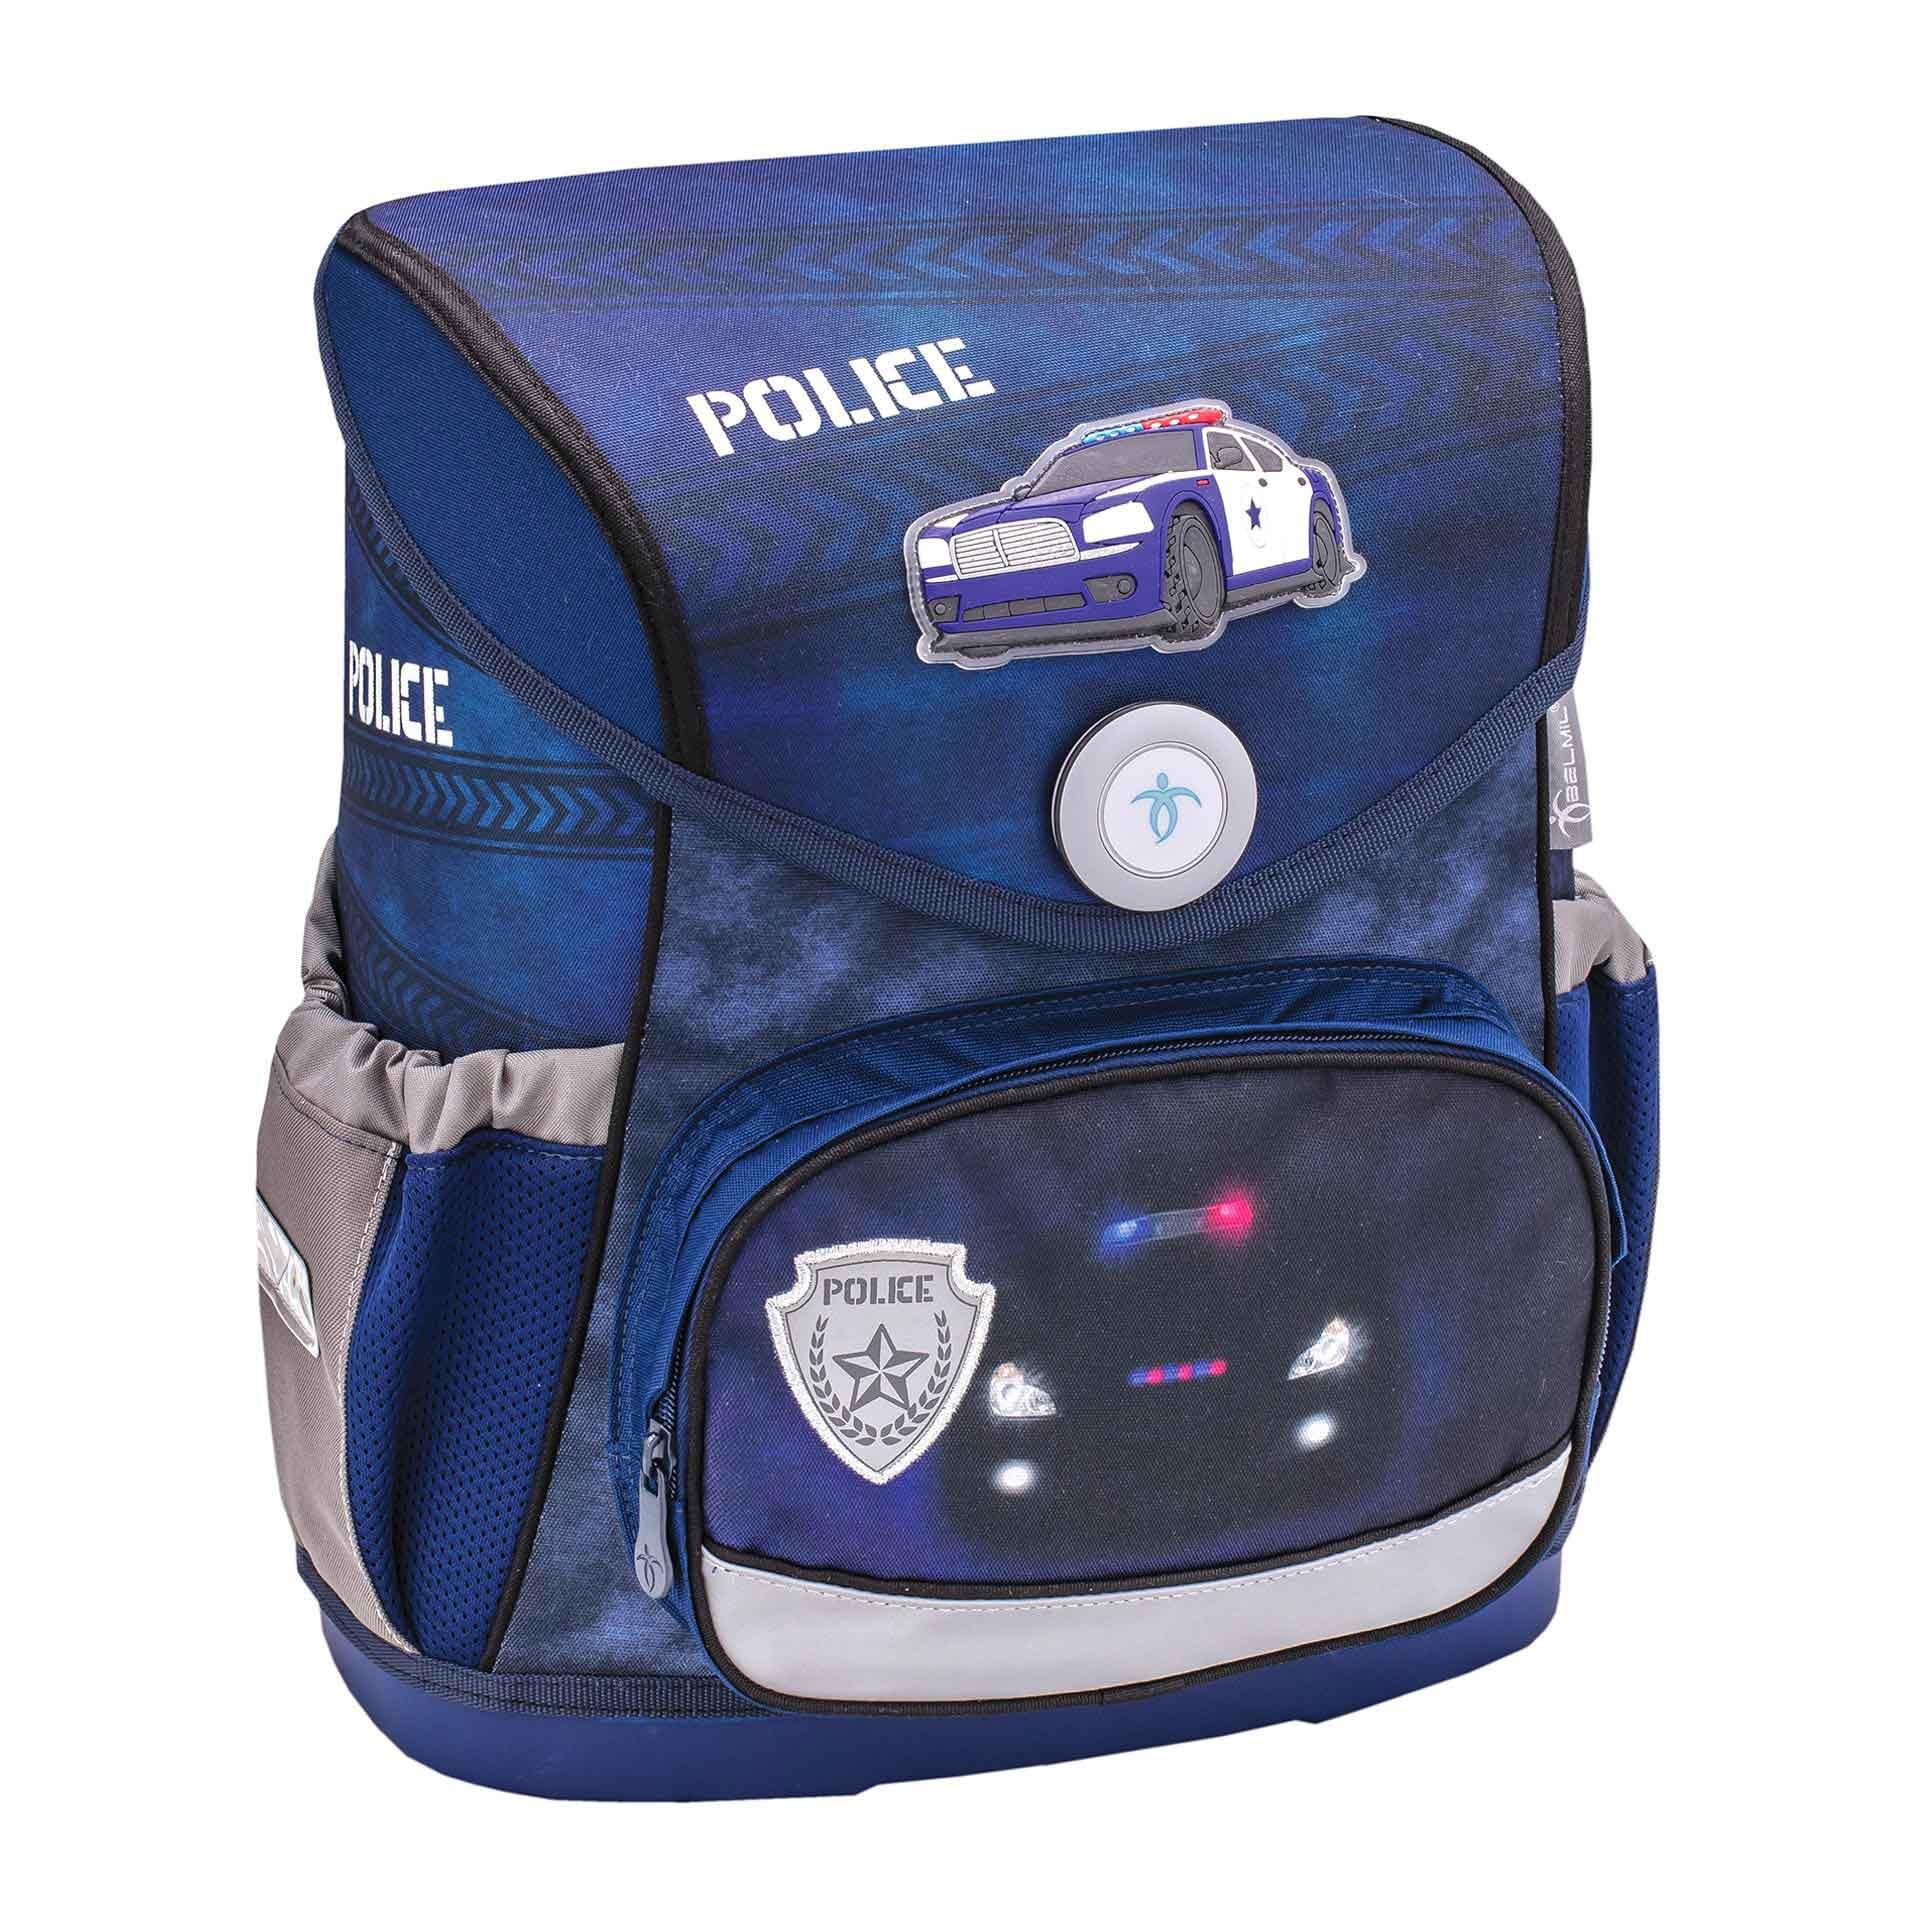 Belmil Compact Schulranzen Set 4-teilig Police